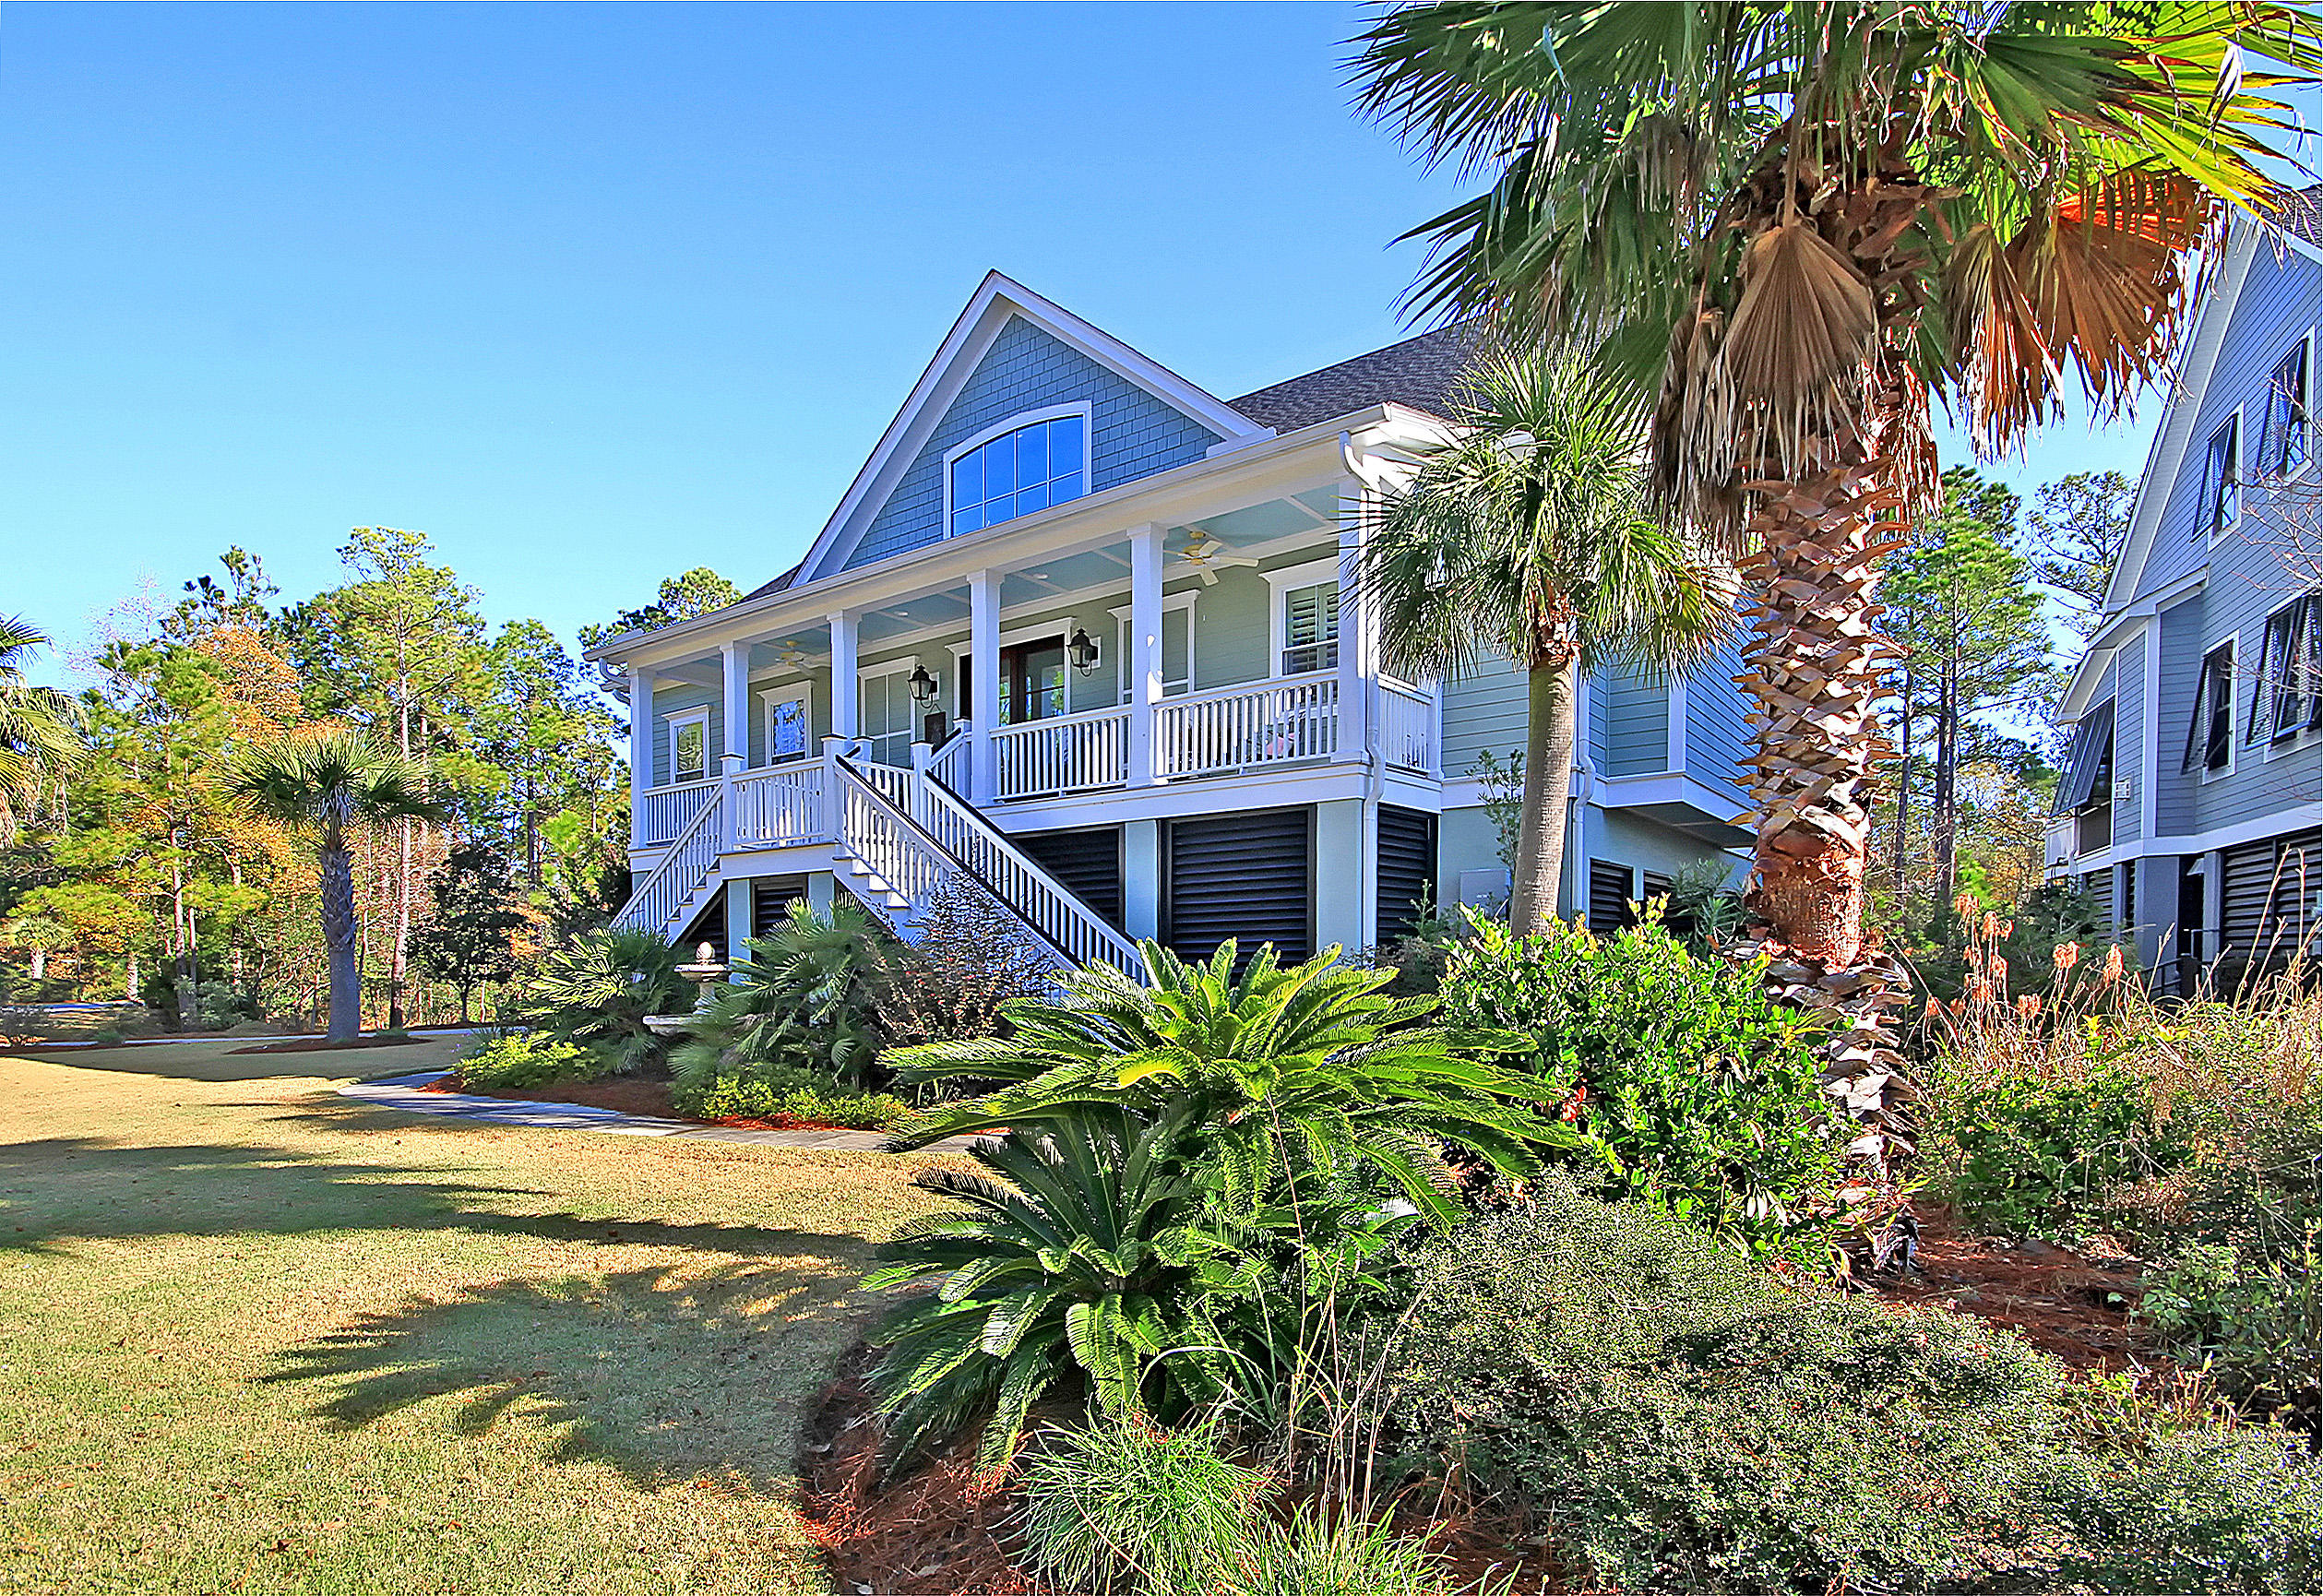 Rivertowne Country Club Homes For Sale - 2601 Kiln Creek, Mount Pleasant, SC - 11